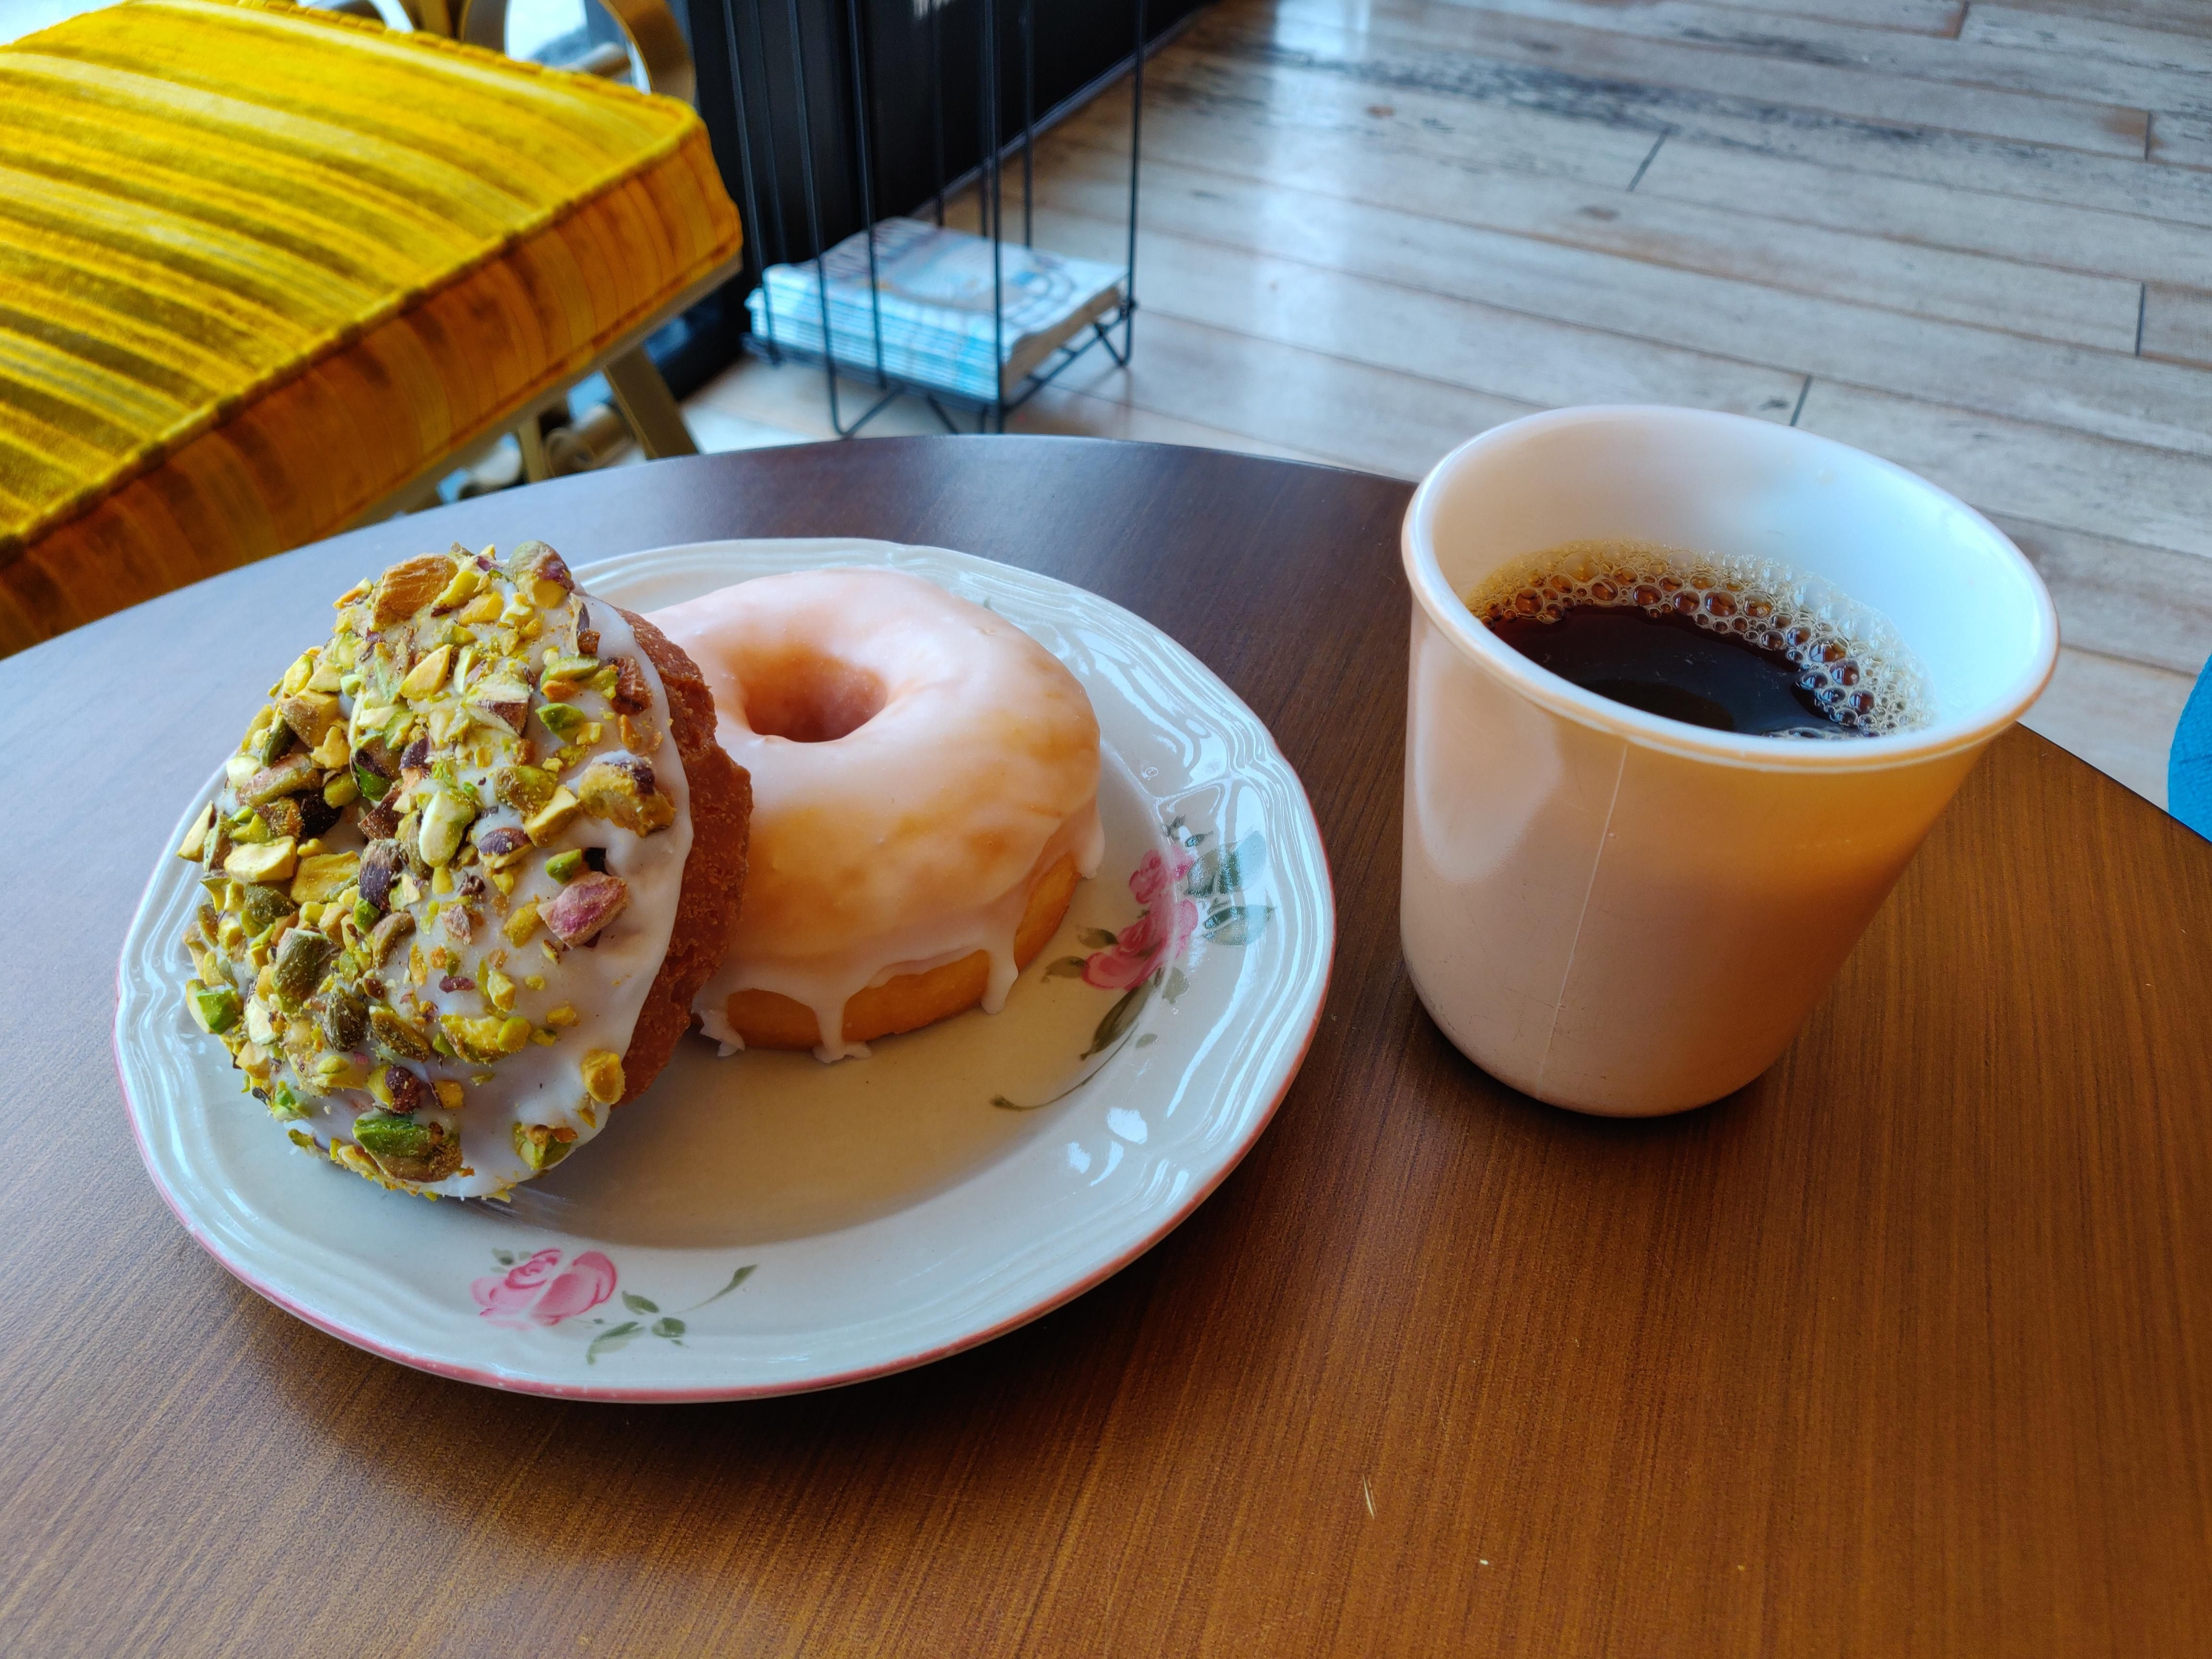 Big O Doughnuts in Salt Lake City Food, Breakfast, Eggs